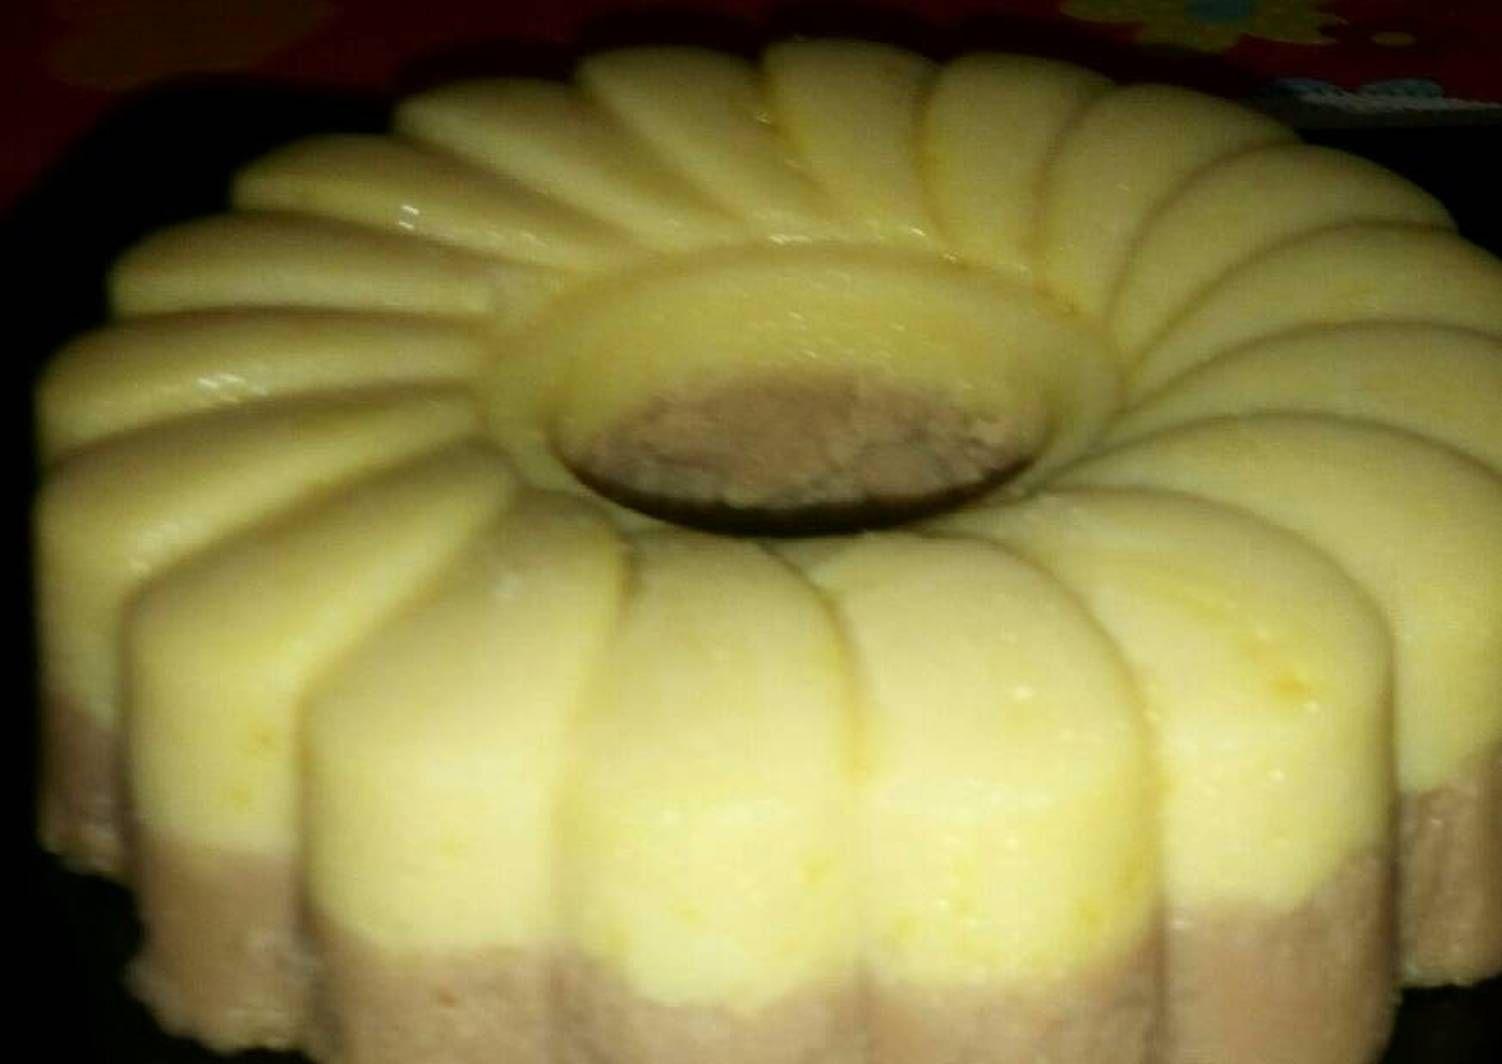 Resep Steam Milo Cheese Cake Oleh Nurlaila Sukmawati Resep Kue Keju Resep Masakan Makanan Dan Minuman